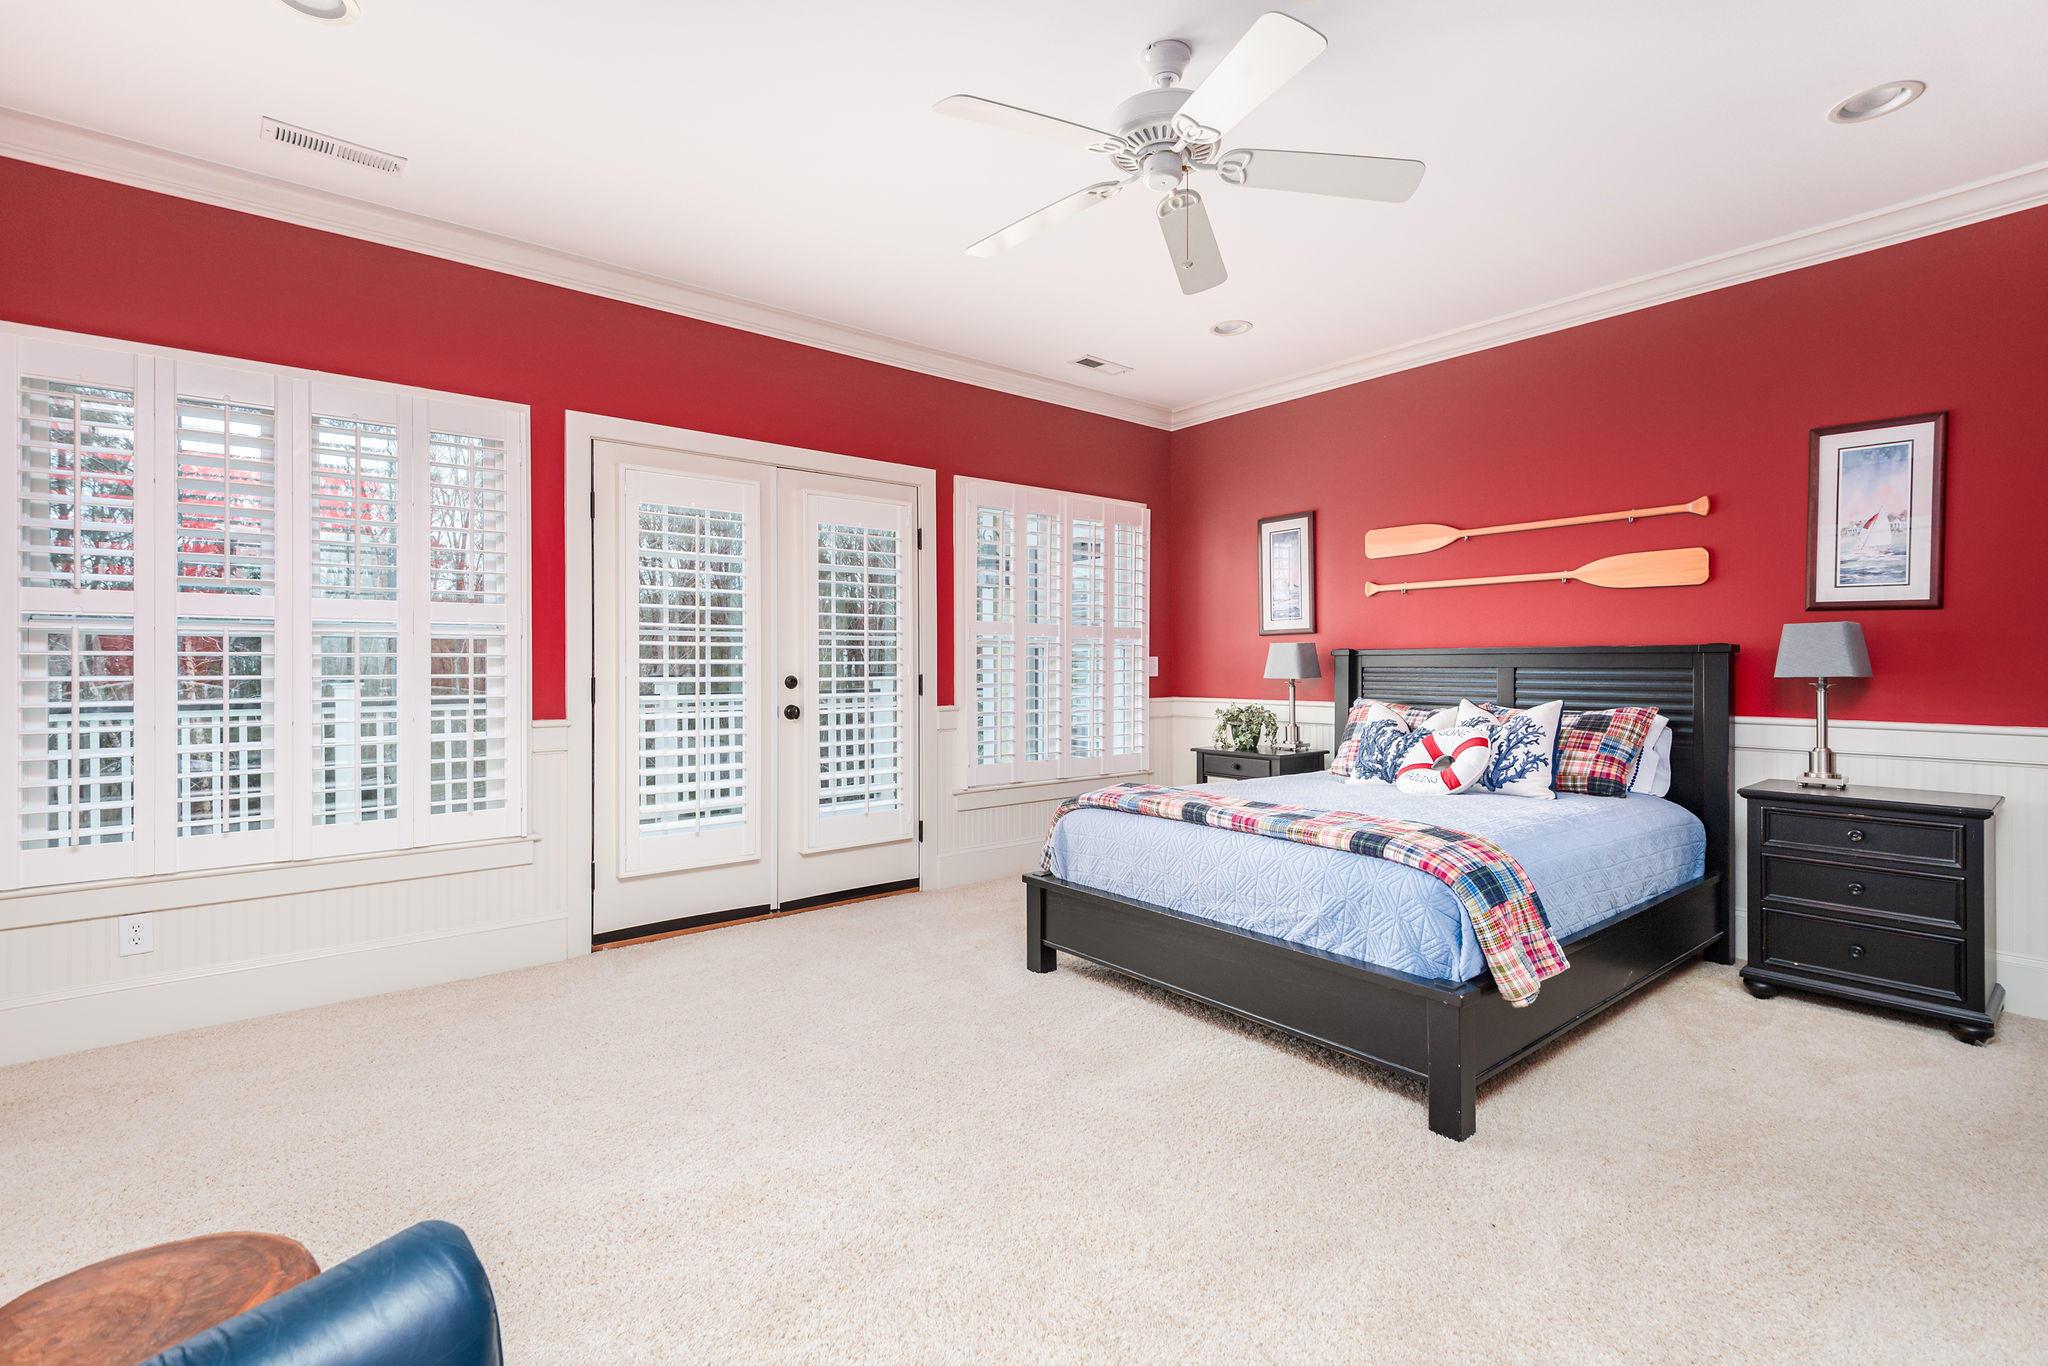 Dunes West Homes For Sale - 1305 King Bird, Mount Pleasant, SC - 2